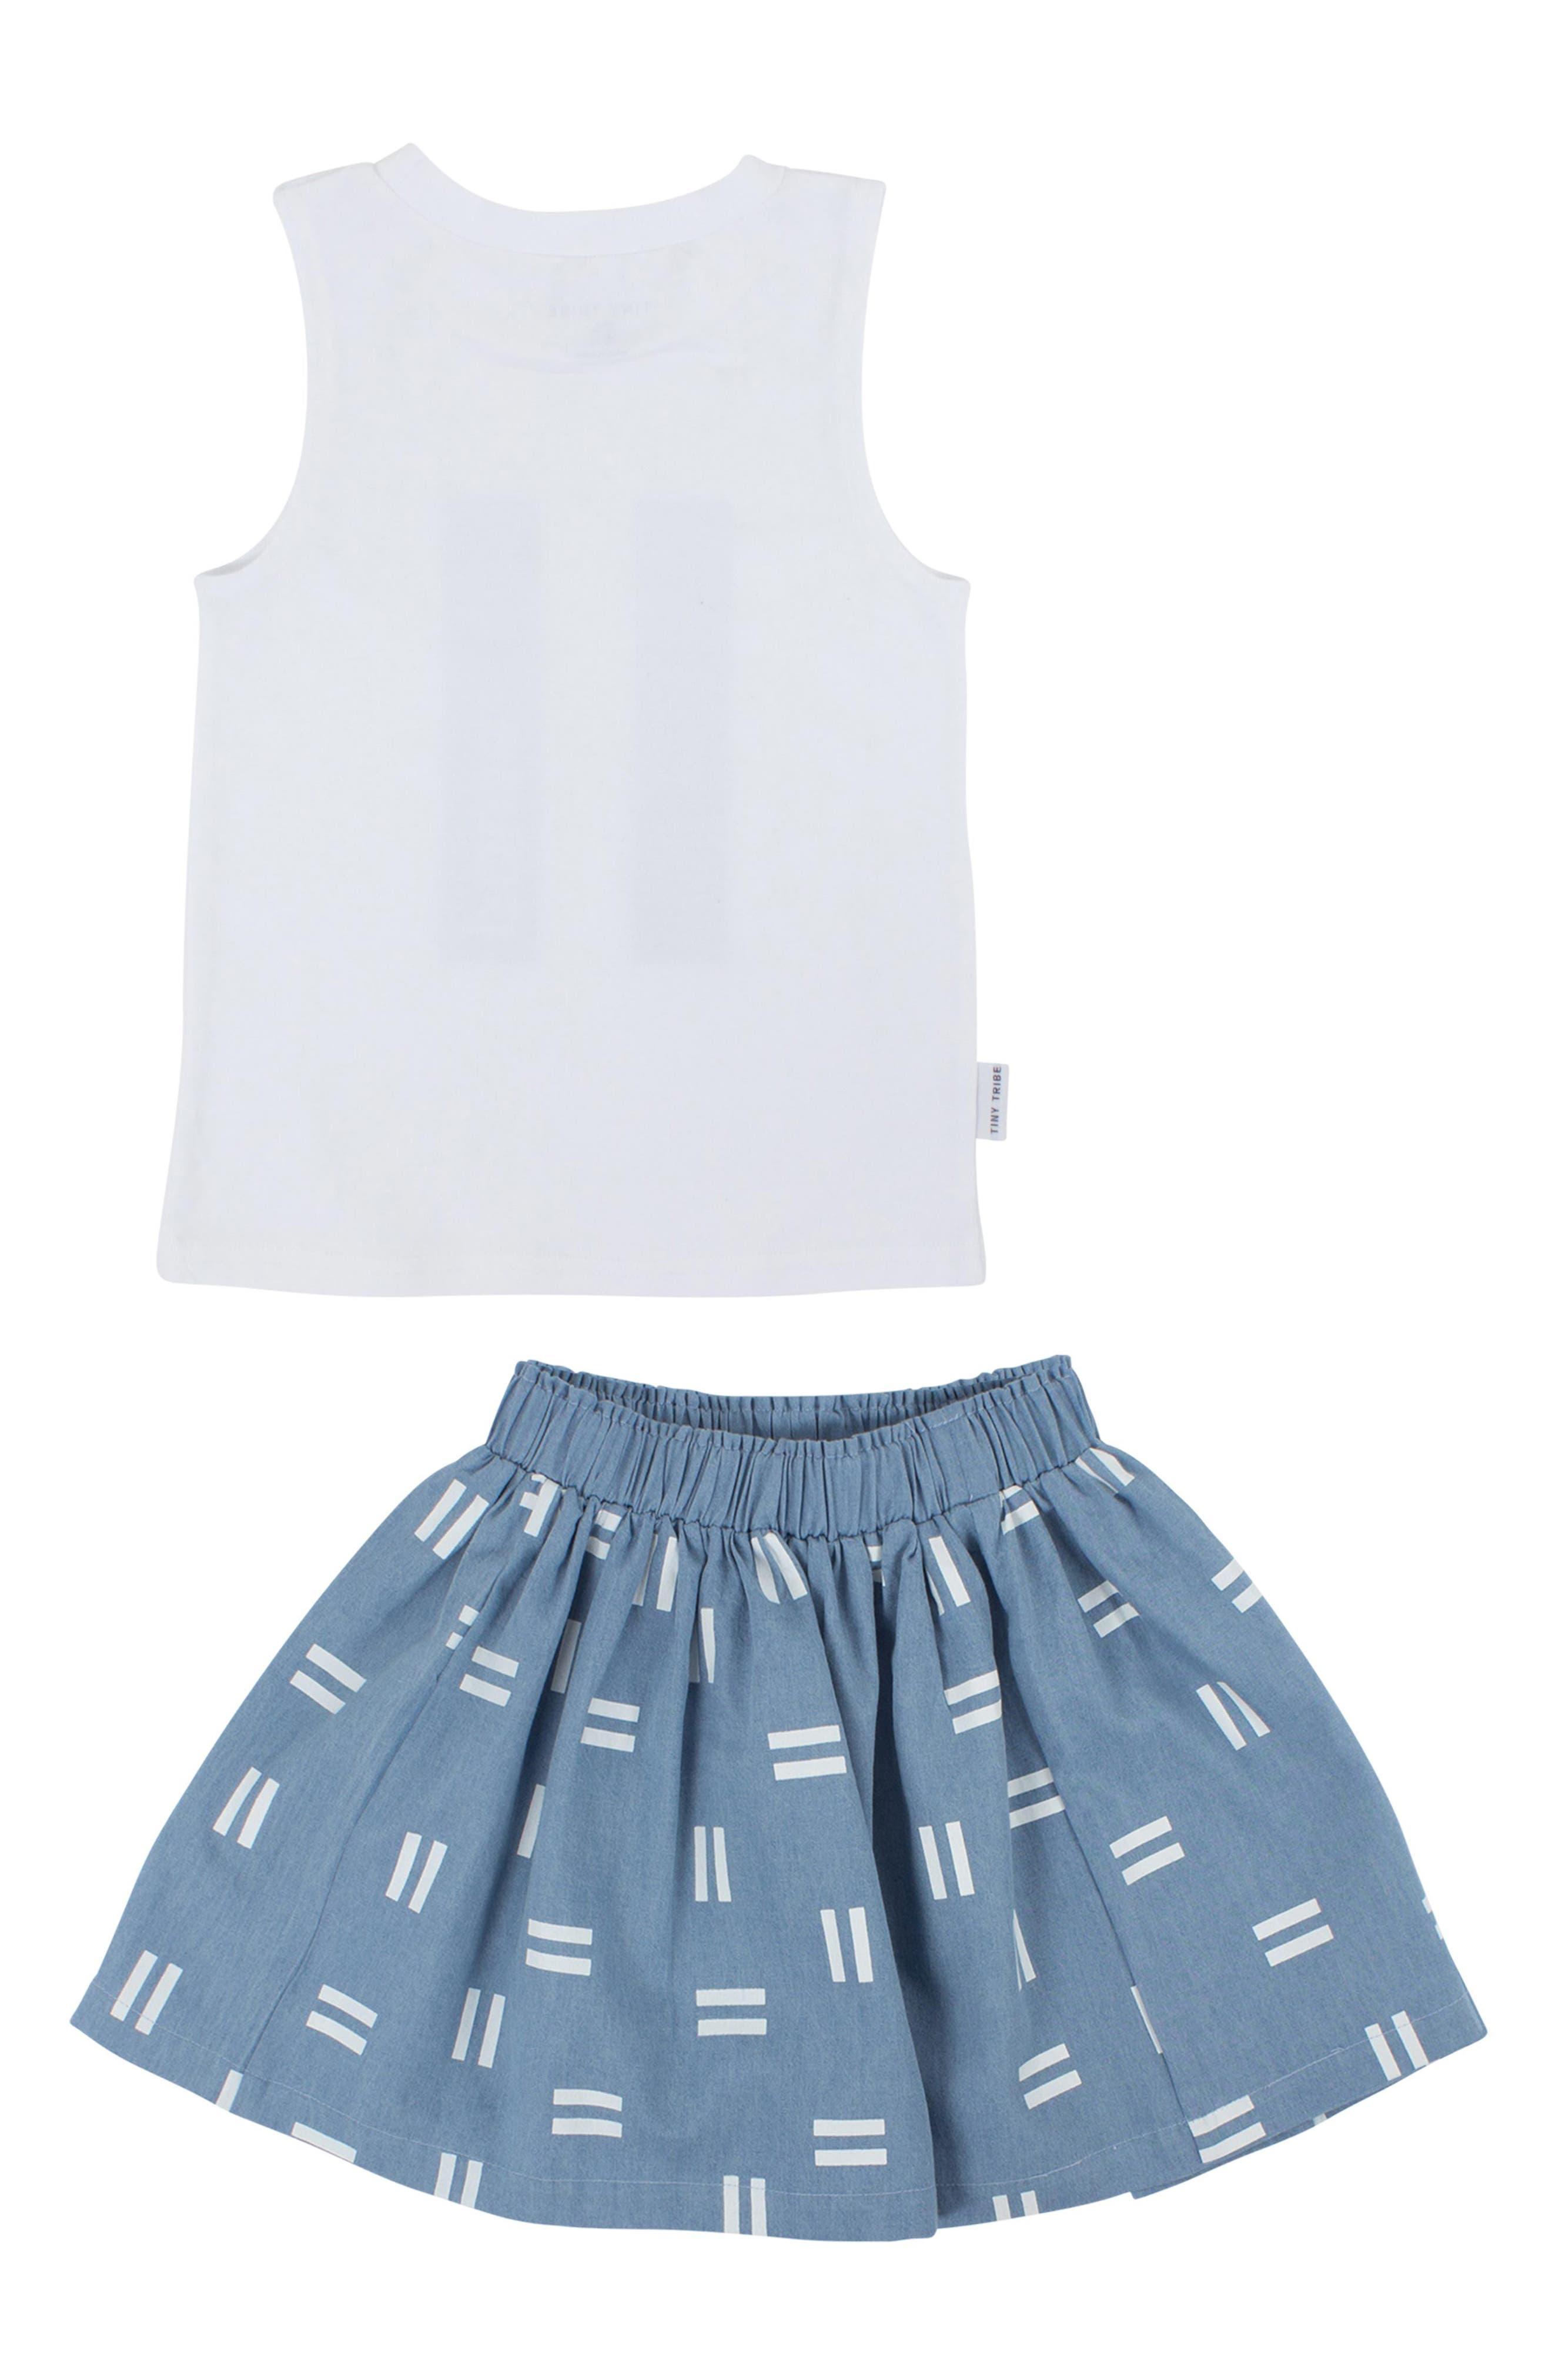 Pause Tank & Chambray Skirt Set,                             Alternate thumbnail 2, color,                             100